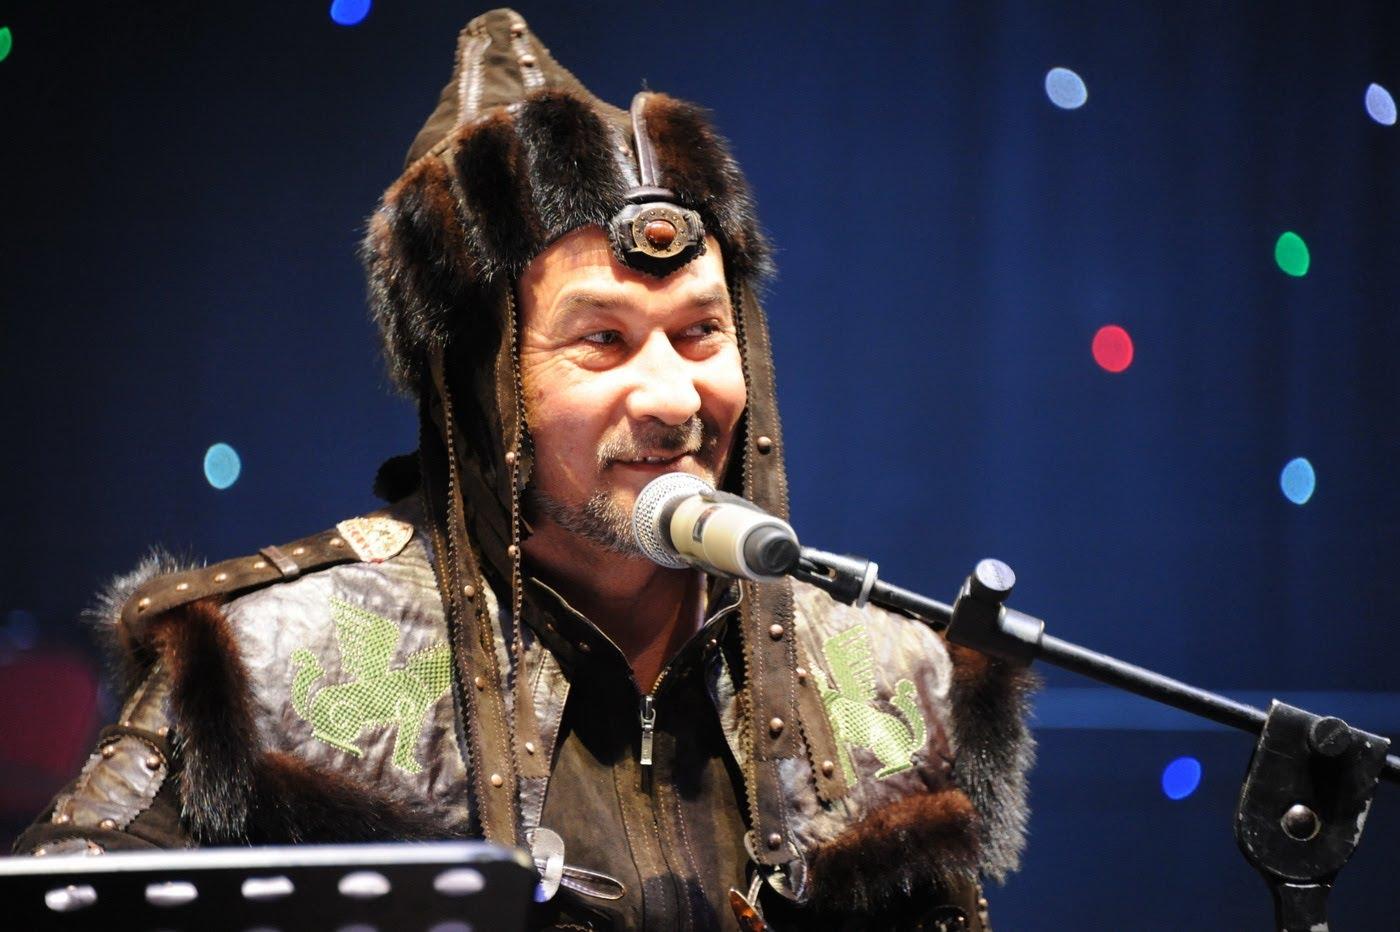 Arslanbek Sultanbeko